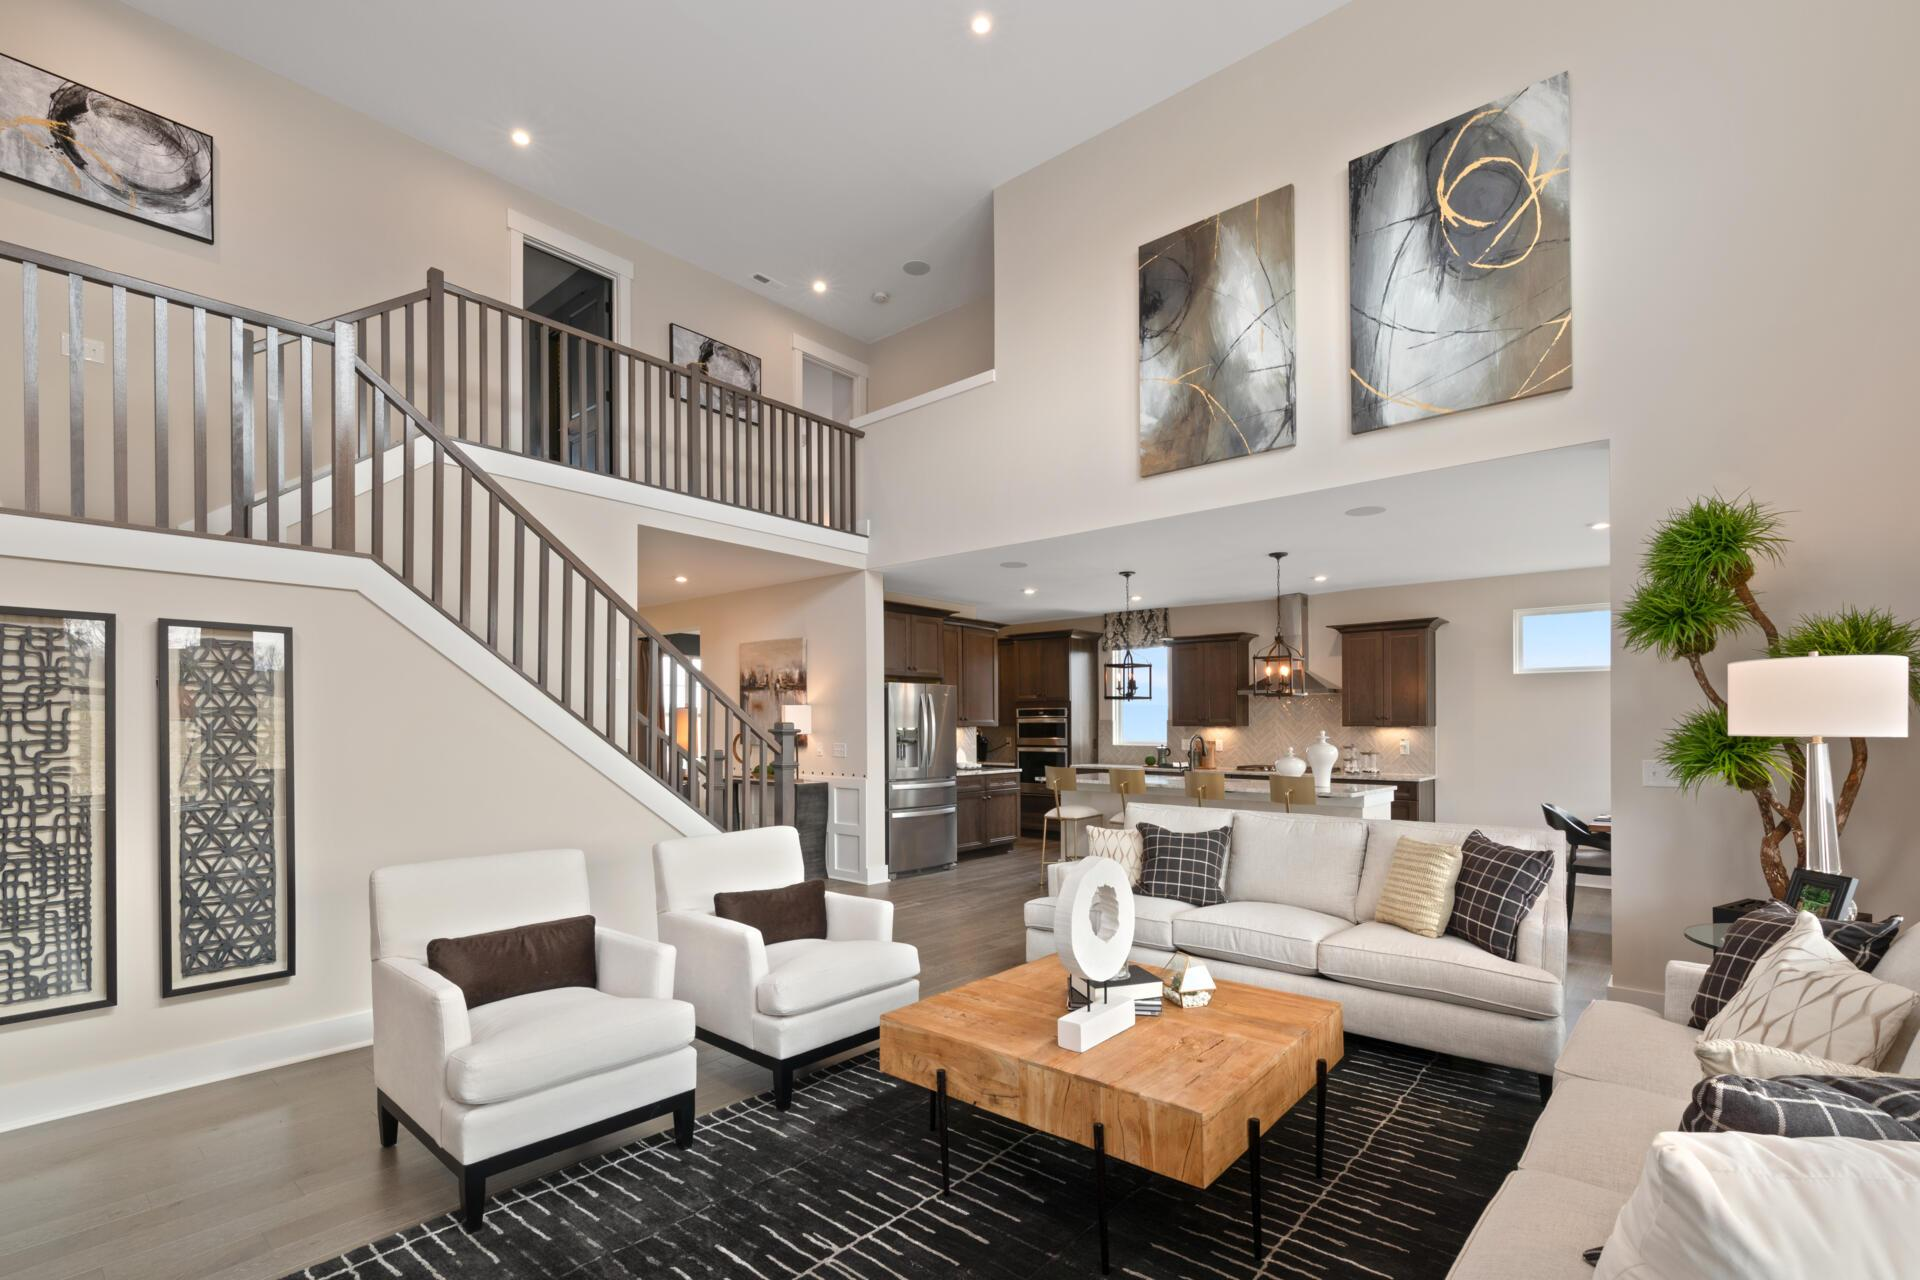 'Shannon Ridge' by Drees Homes in Cincinnati